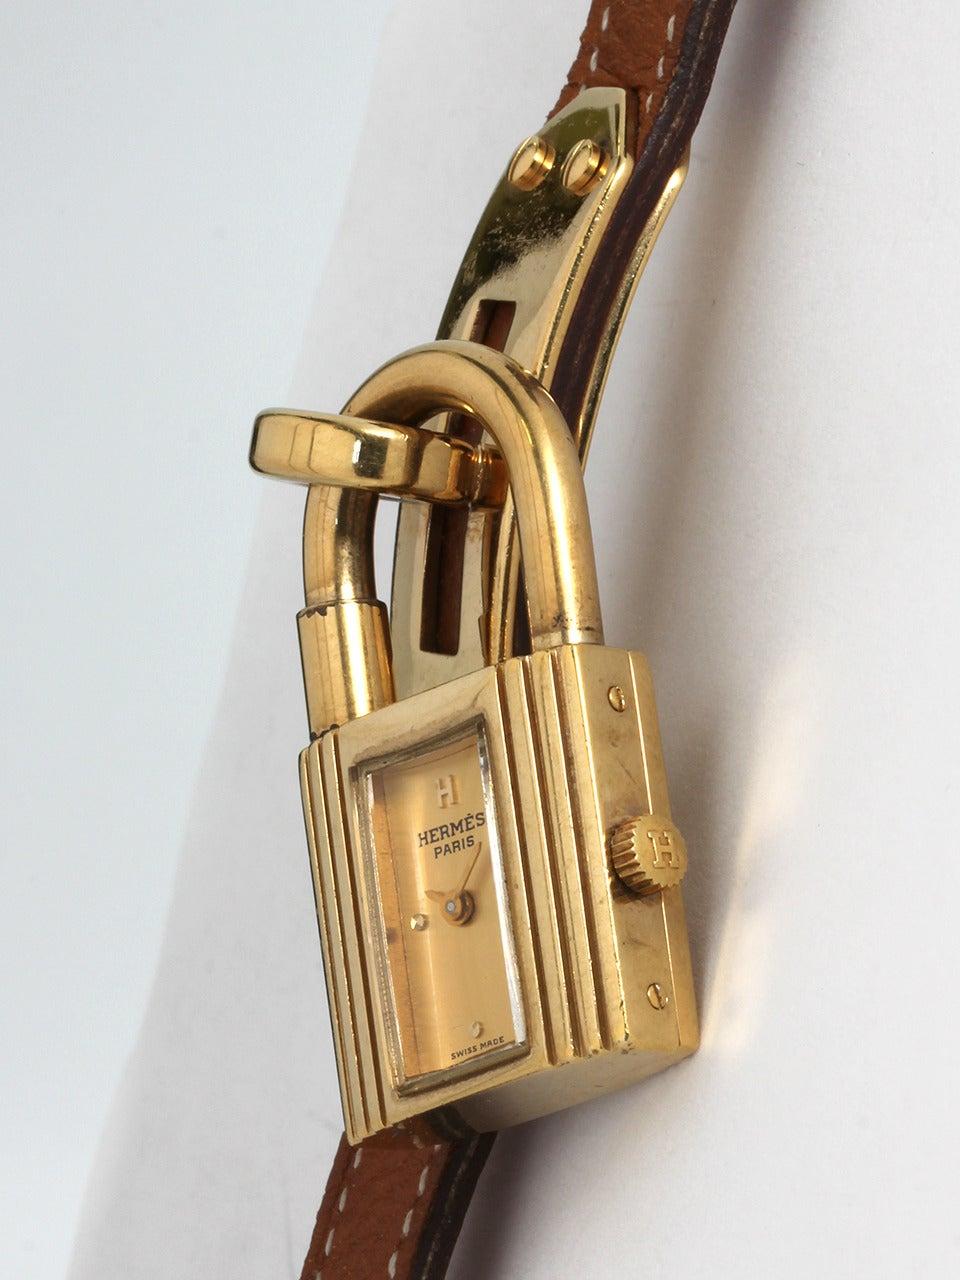 birkin luggage hermes - Hermes Gold Plated Kelly Lock Watch at 1stdibs